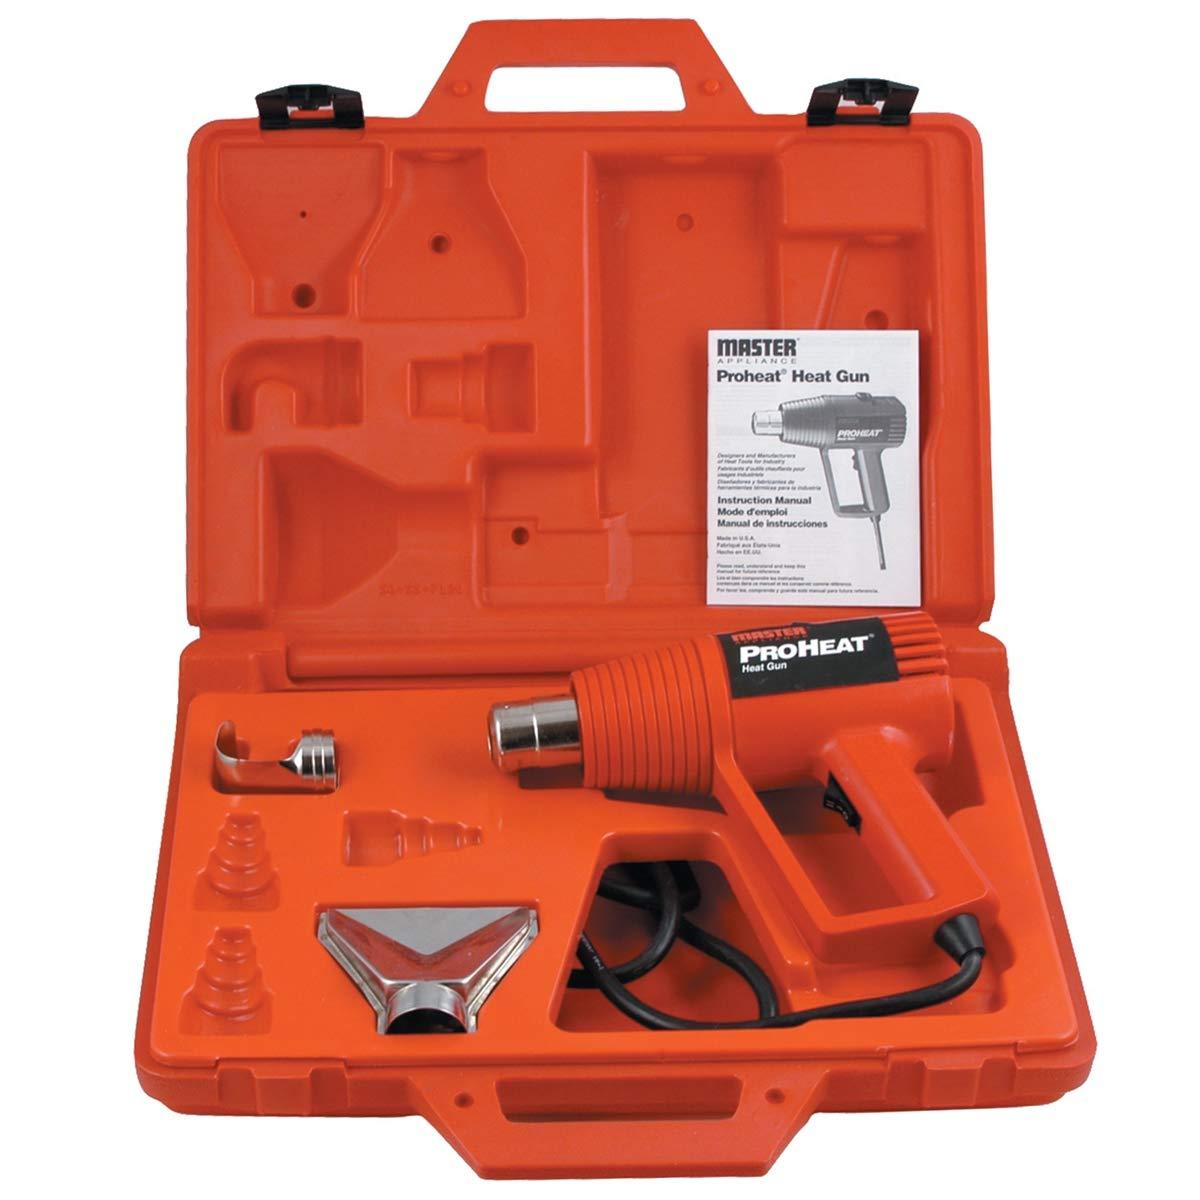 Master Appliance MASPH1100K 1 Pack Gun pro Heat w/2 attachments & case by Master Appliance (Image #1)